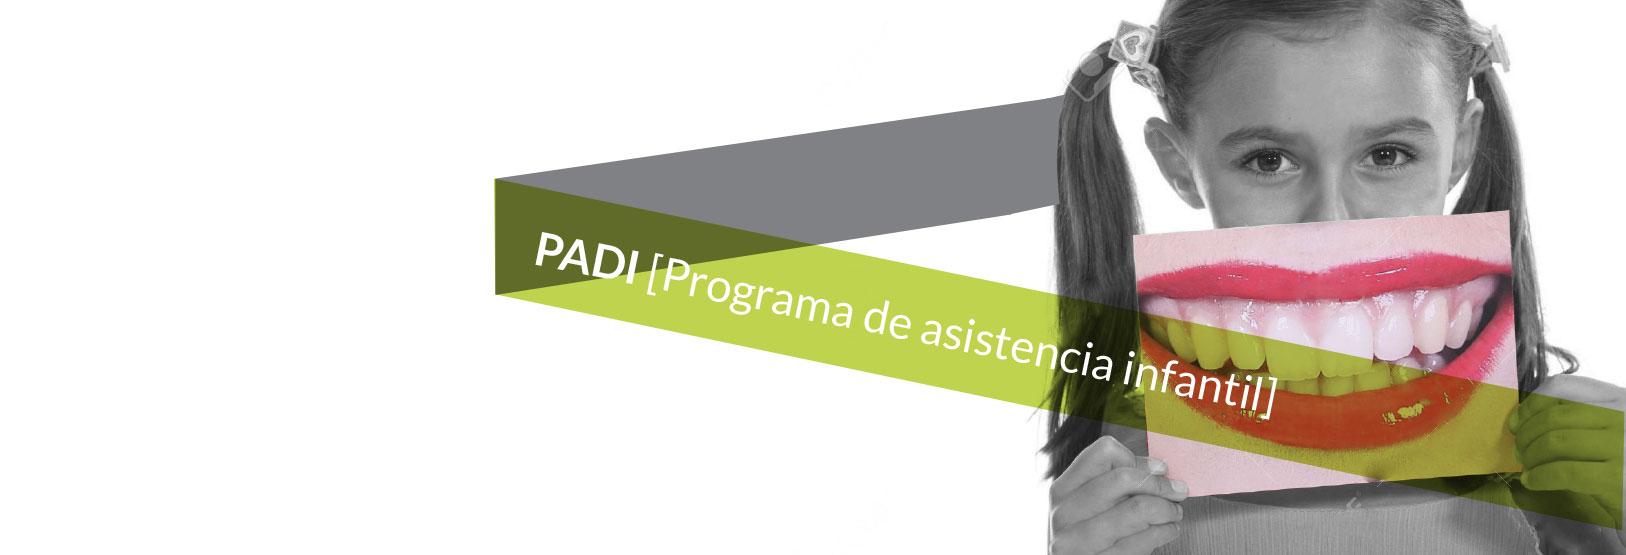 PADI-asistencia-bucodental-andalucia-cordoba-clínica-dental-peran